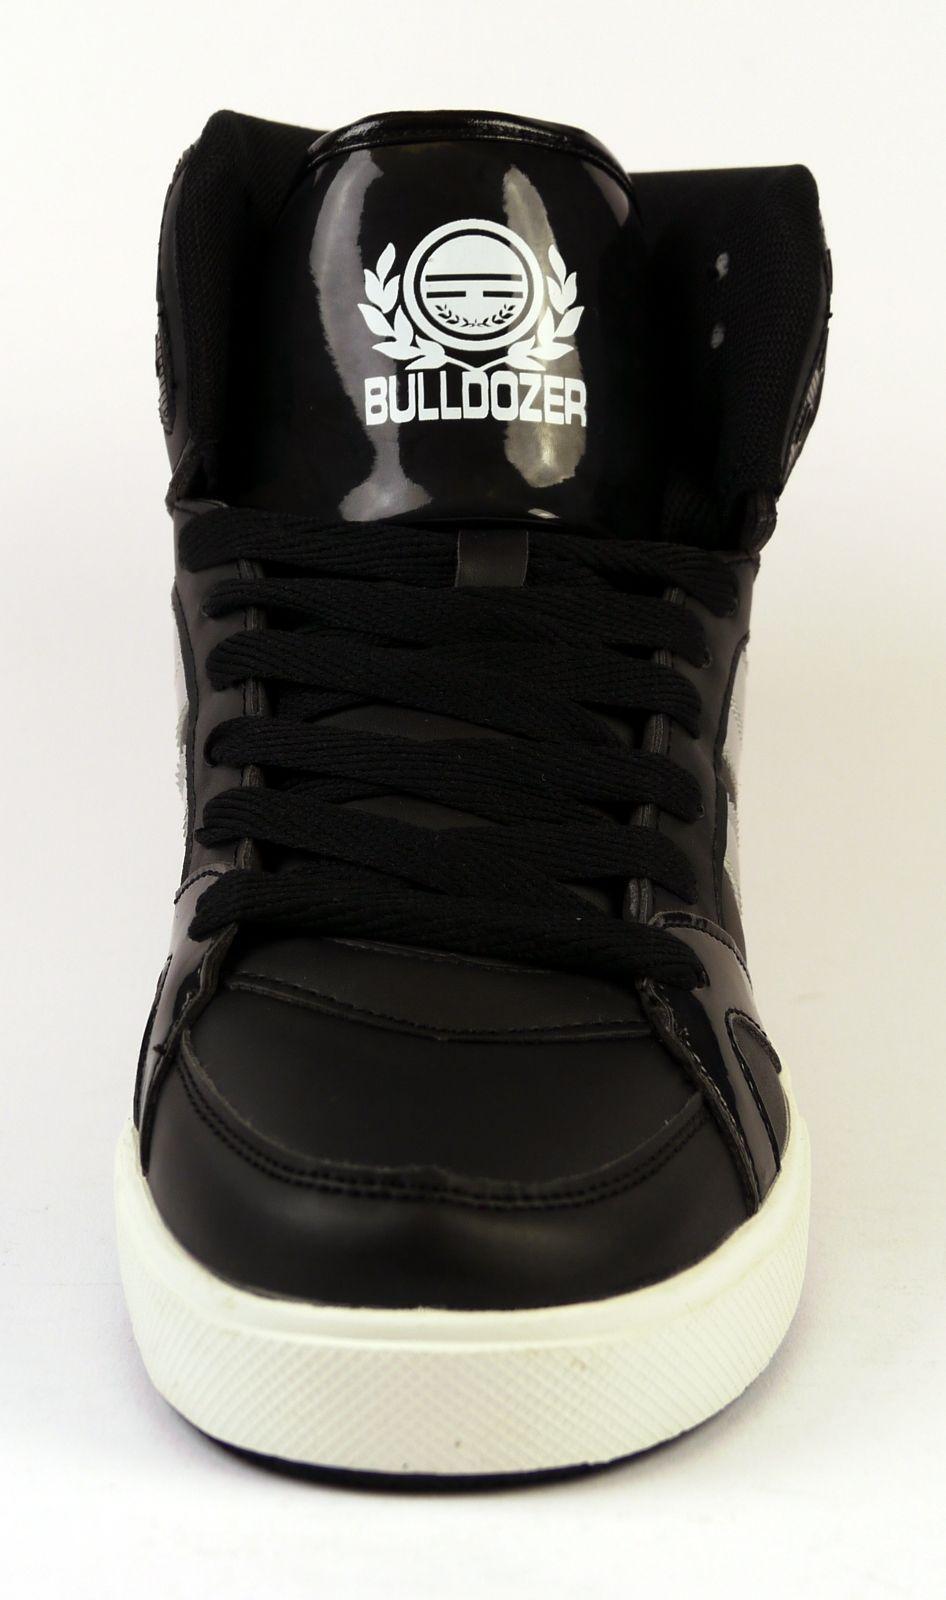 b6c7f895003d Bulldozer High-Top Sneaker schwarz http   www.ebay.de itm Bulldozer ...